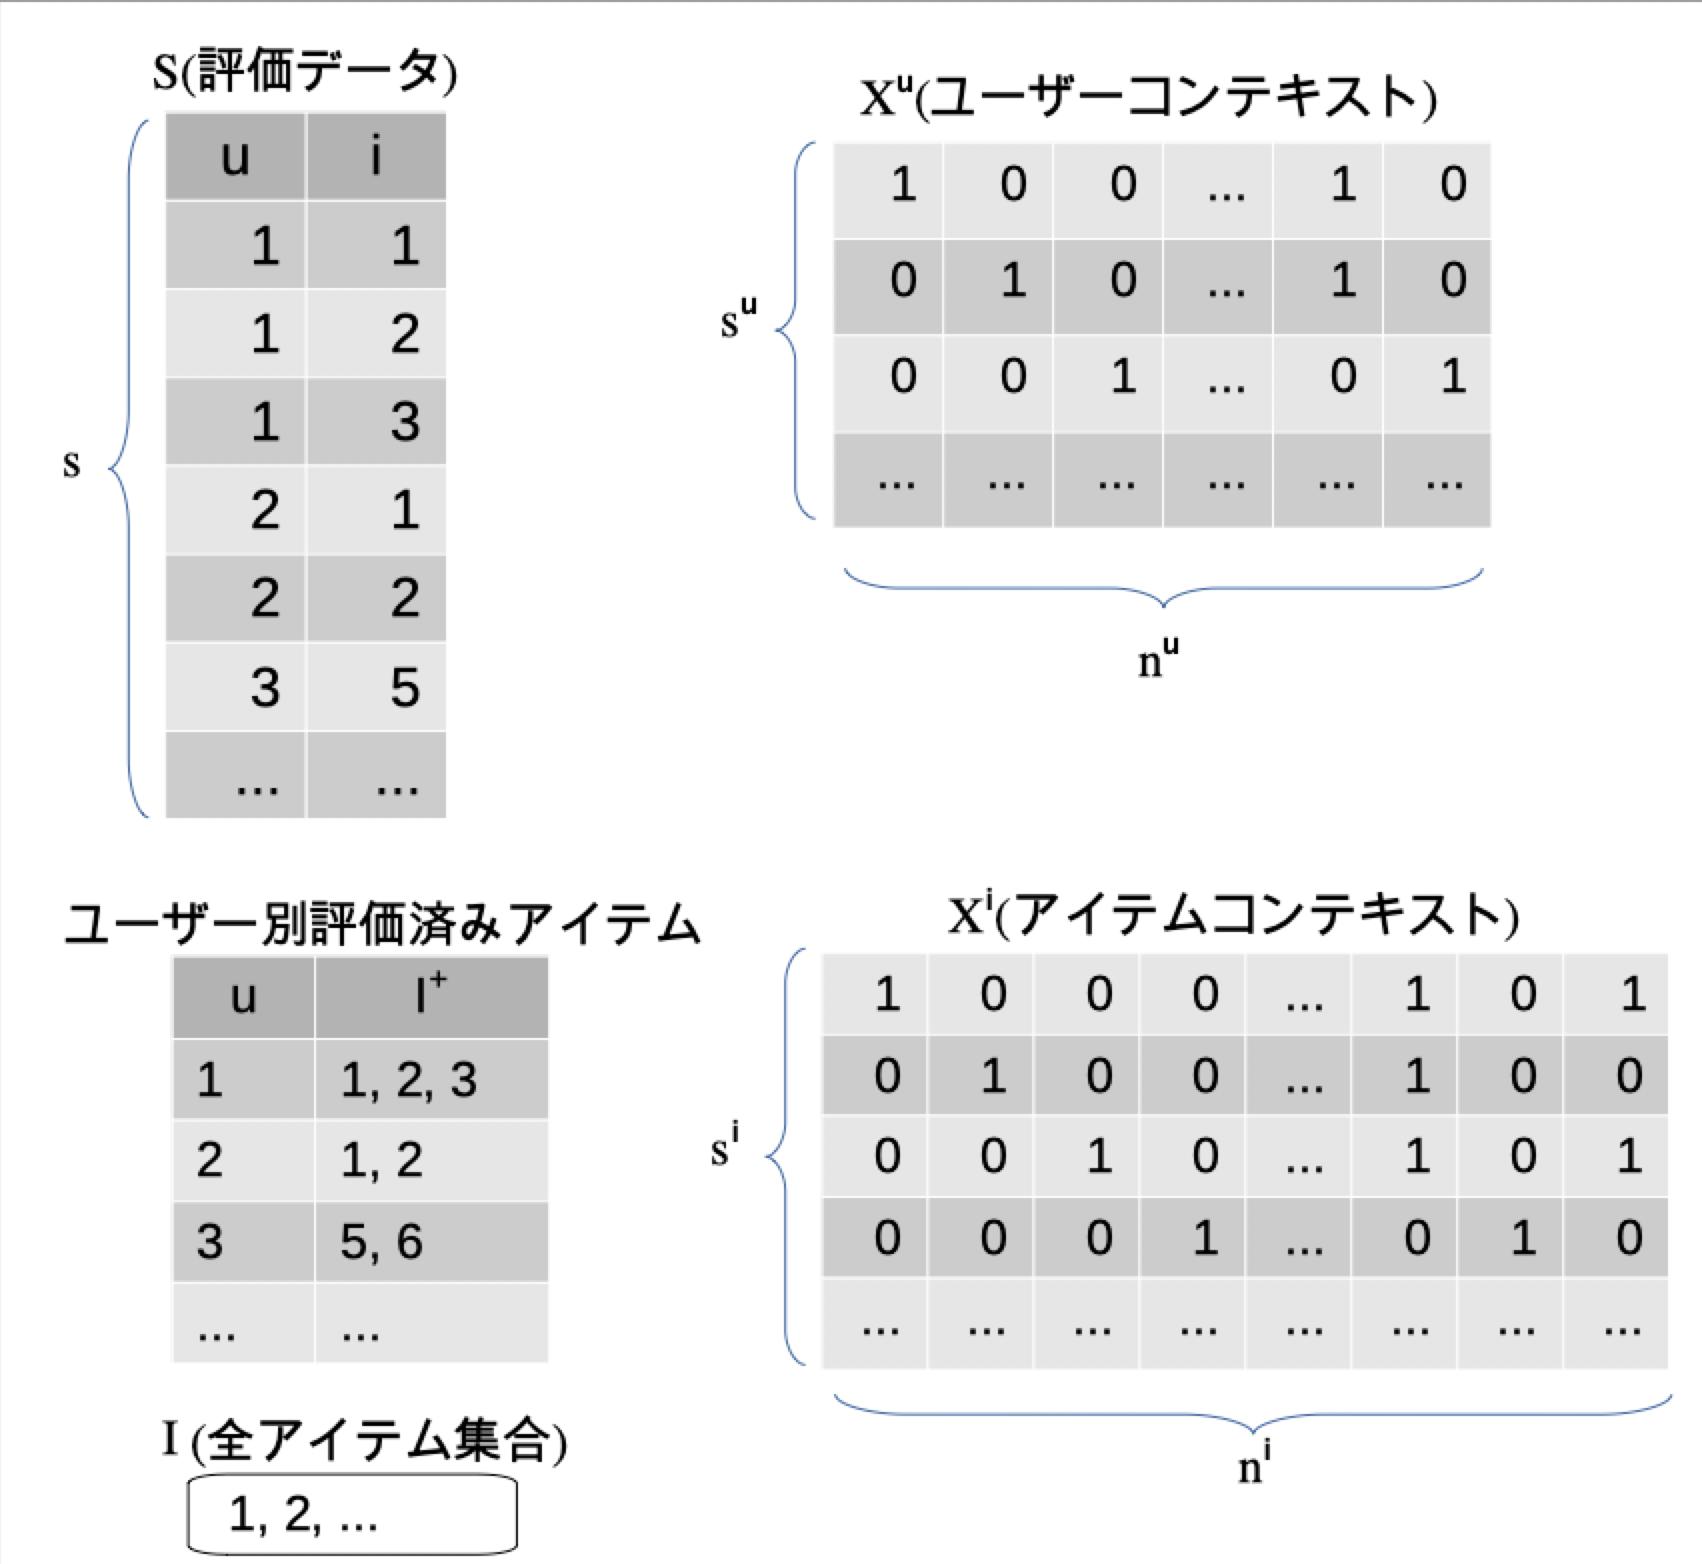 f:id:livesense-analytics:20200720093836p:plain